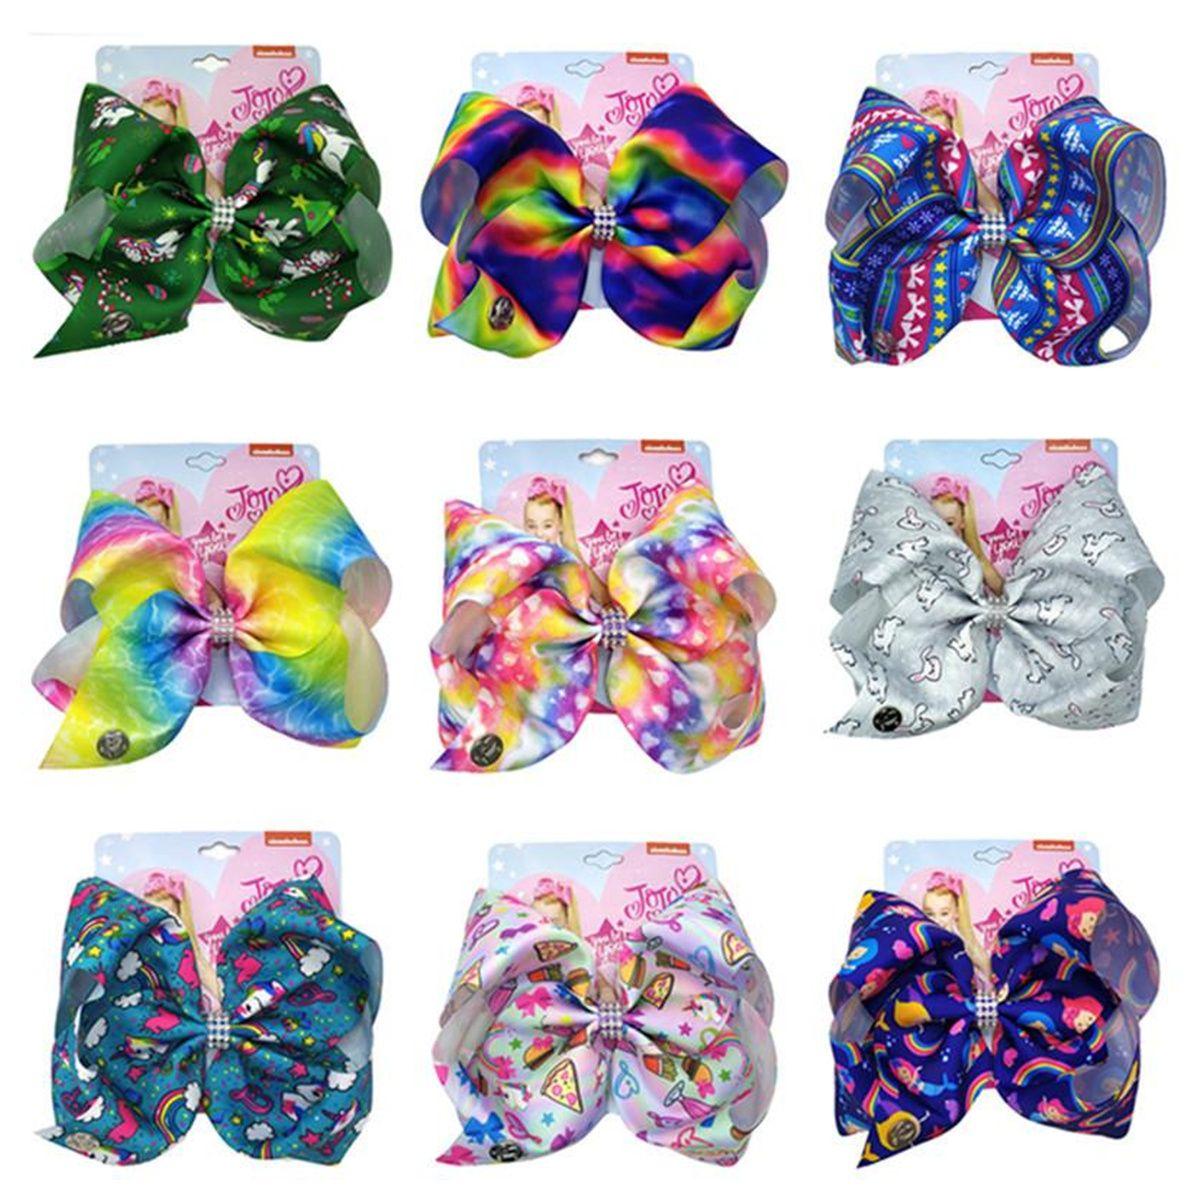 Мода Девушки Swia Bow Boot Hair Clip Bows Bowlfly Knot HairClip Barnettes Для Детских Художник Прикосновение Прикосновение Аксессуар для волос С Картоном 17 Цвет